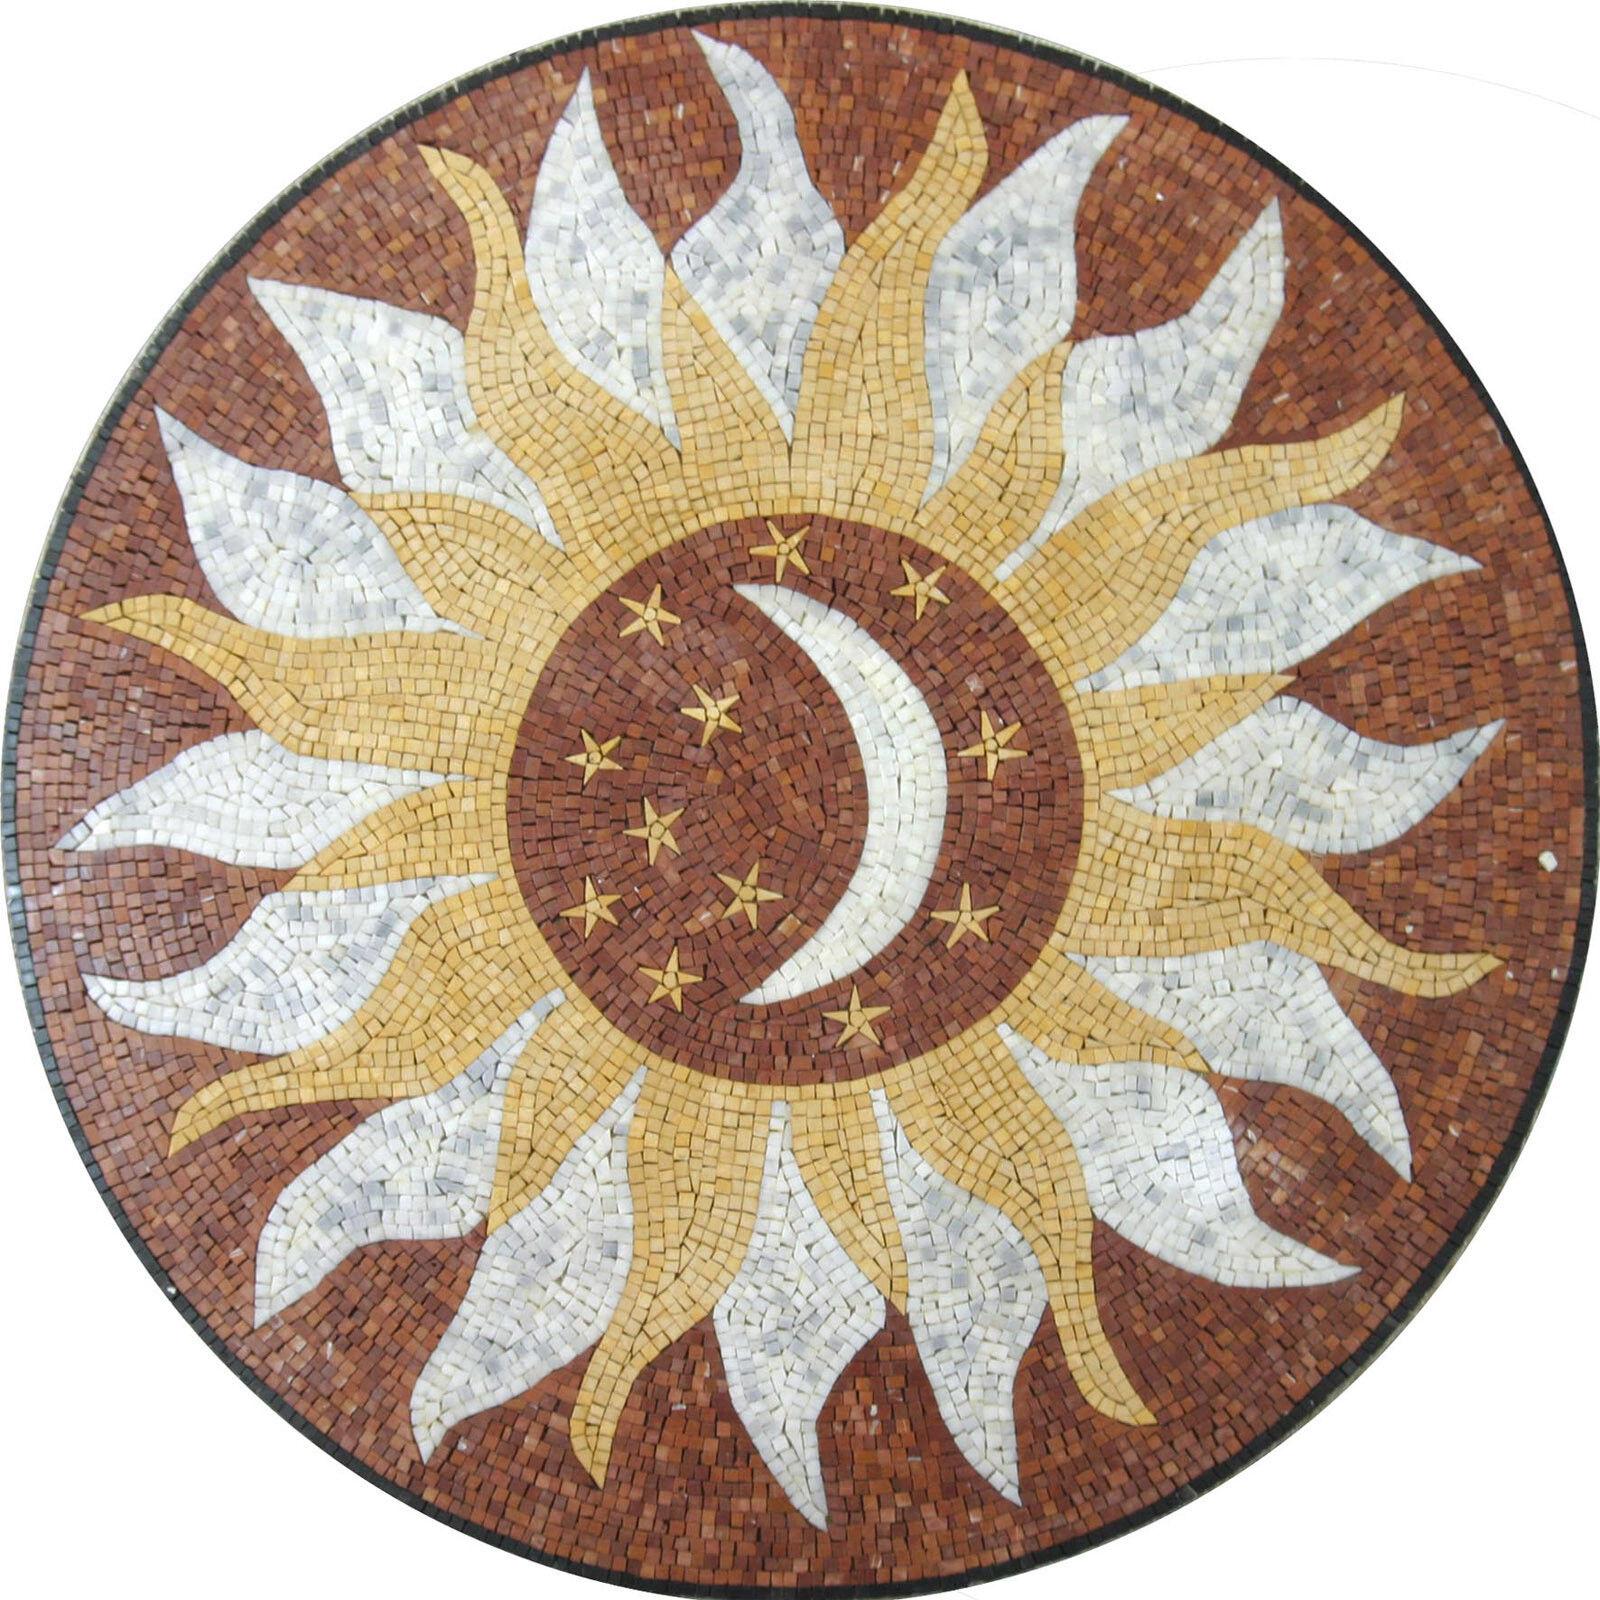 Floor Sun Moon Stars Wall Round Medallion Decor Marble Mosaic MD1009